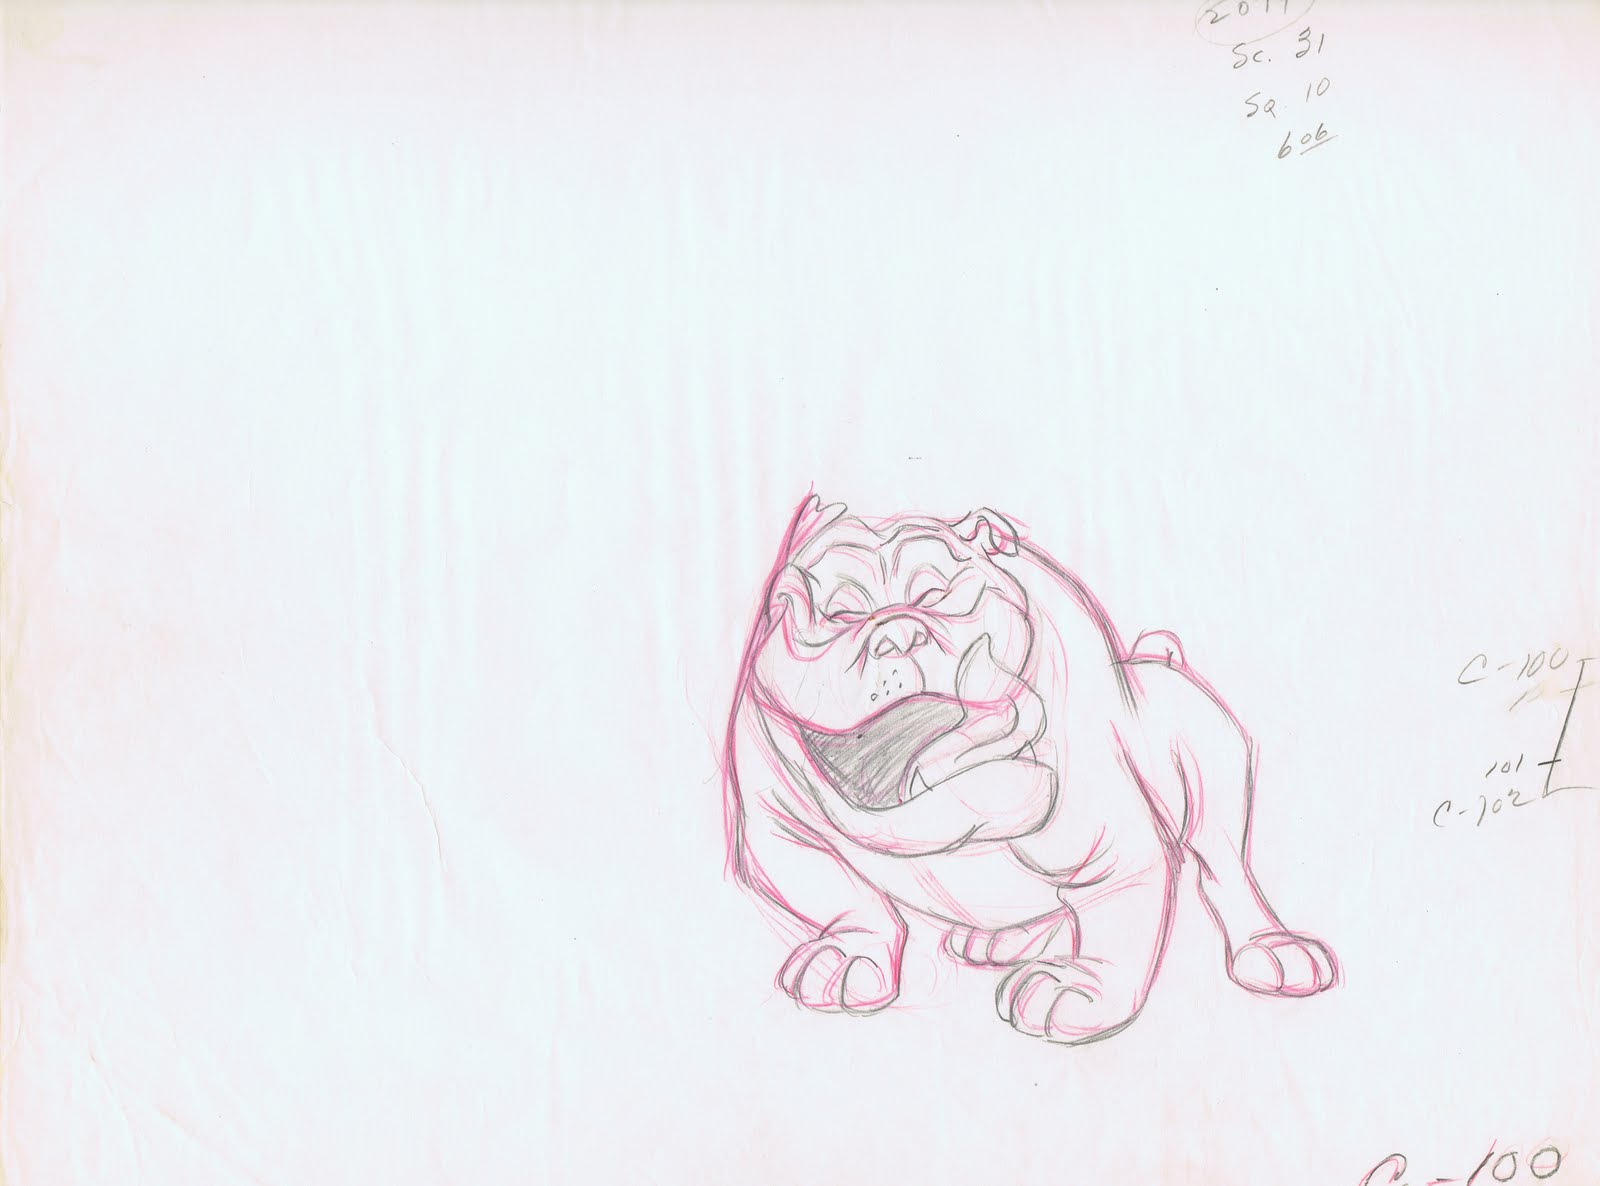 Drawn bulldog disney Me the but Bull of